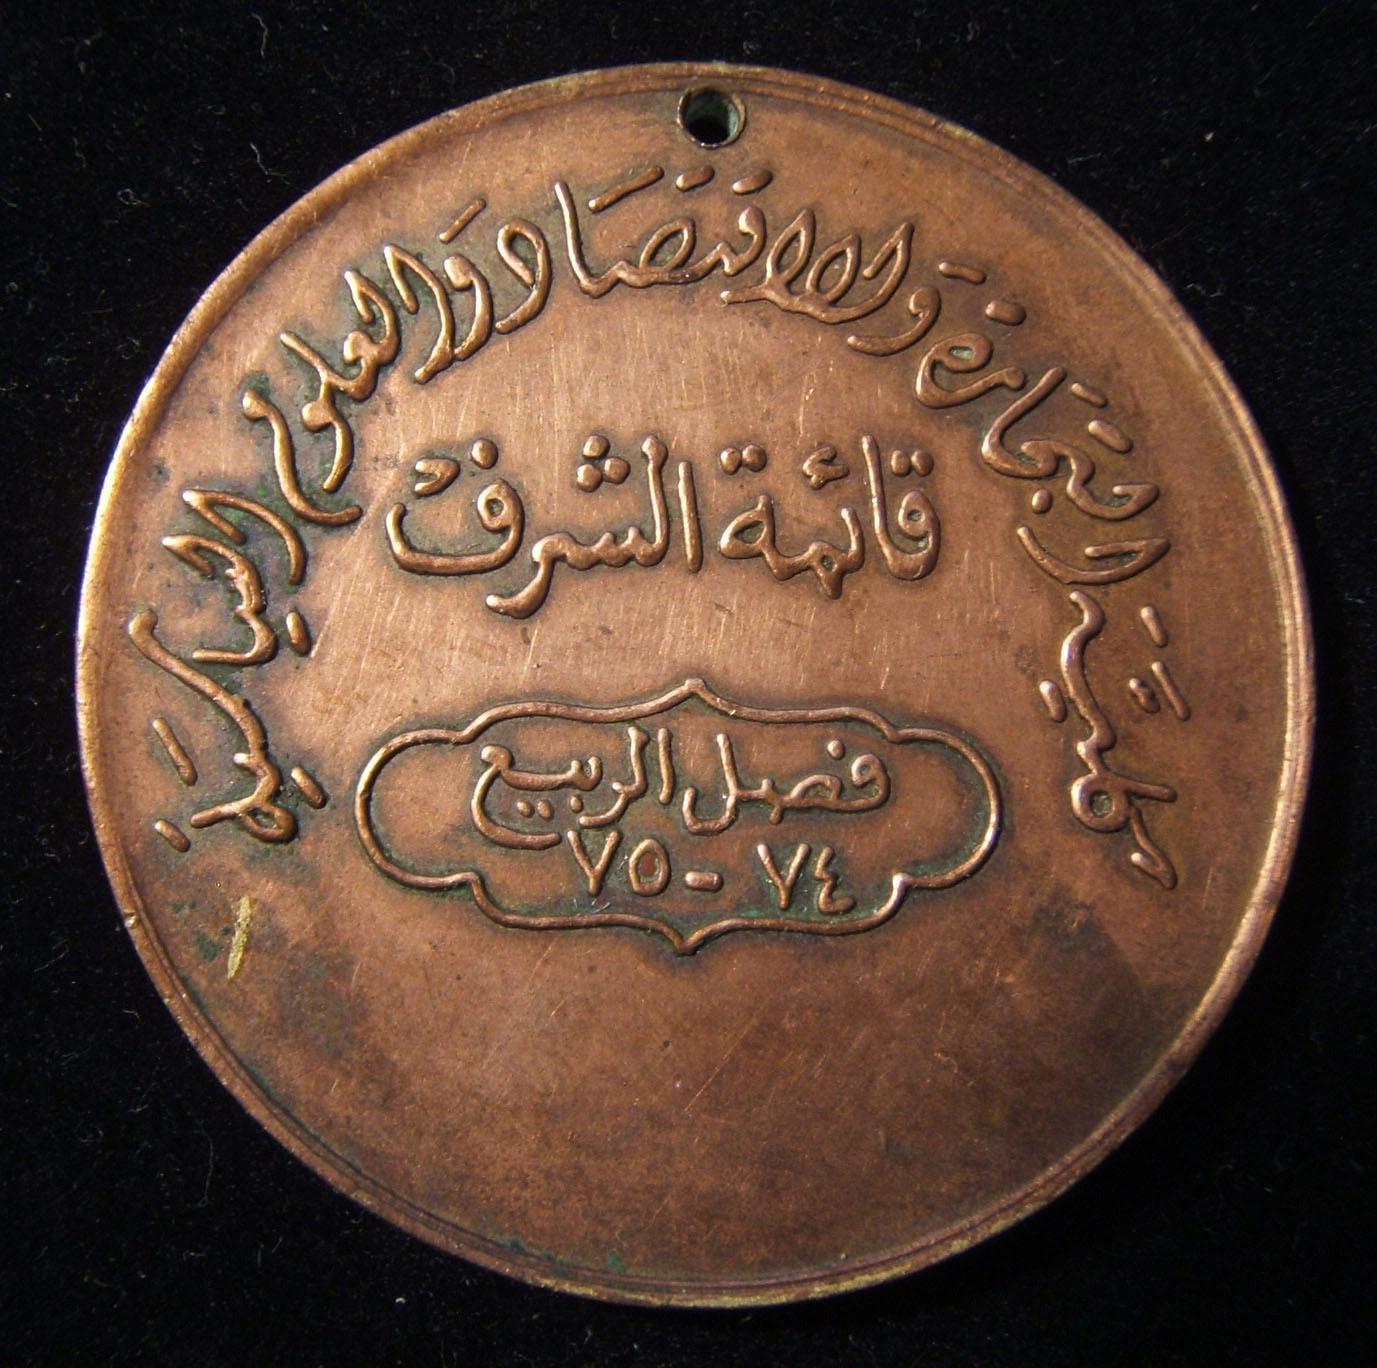 Jordan(?) - University honors medal: legend on obverse & reverse reads